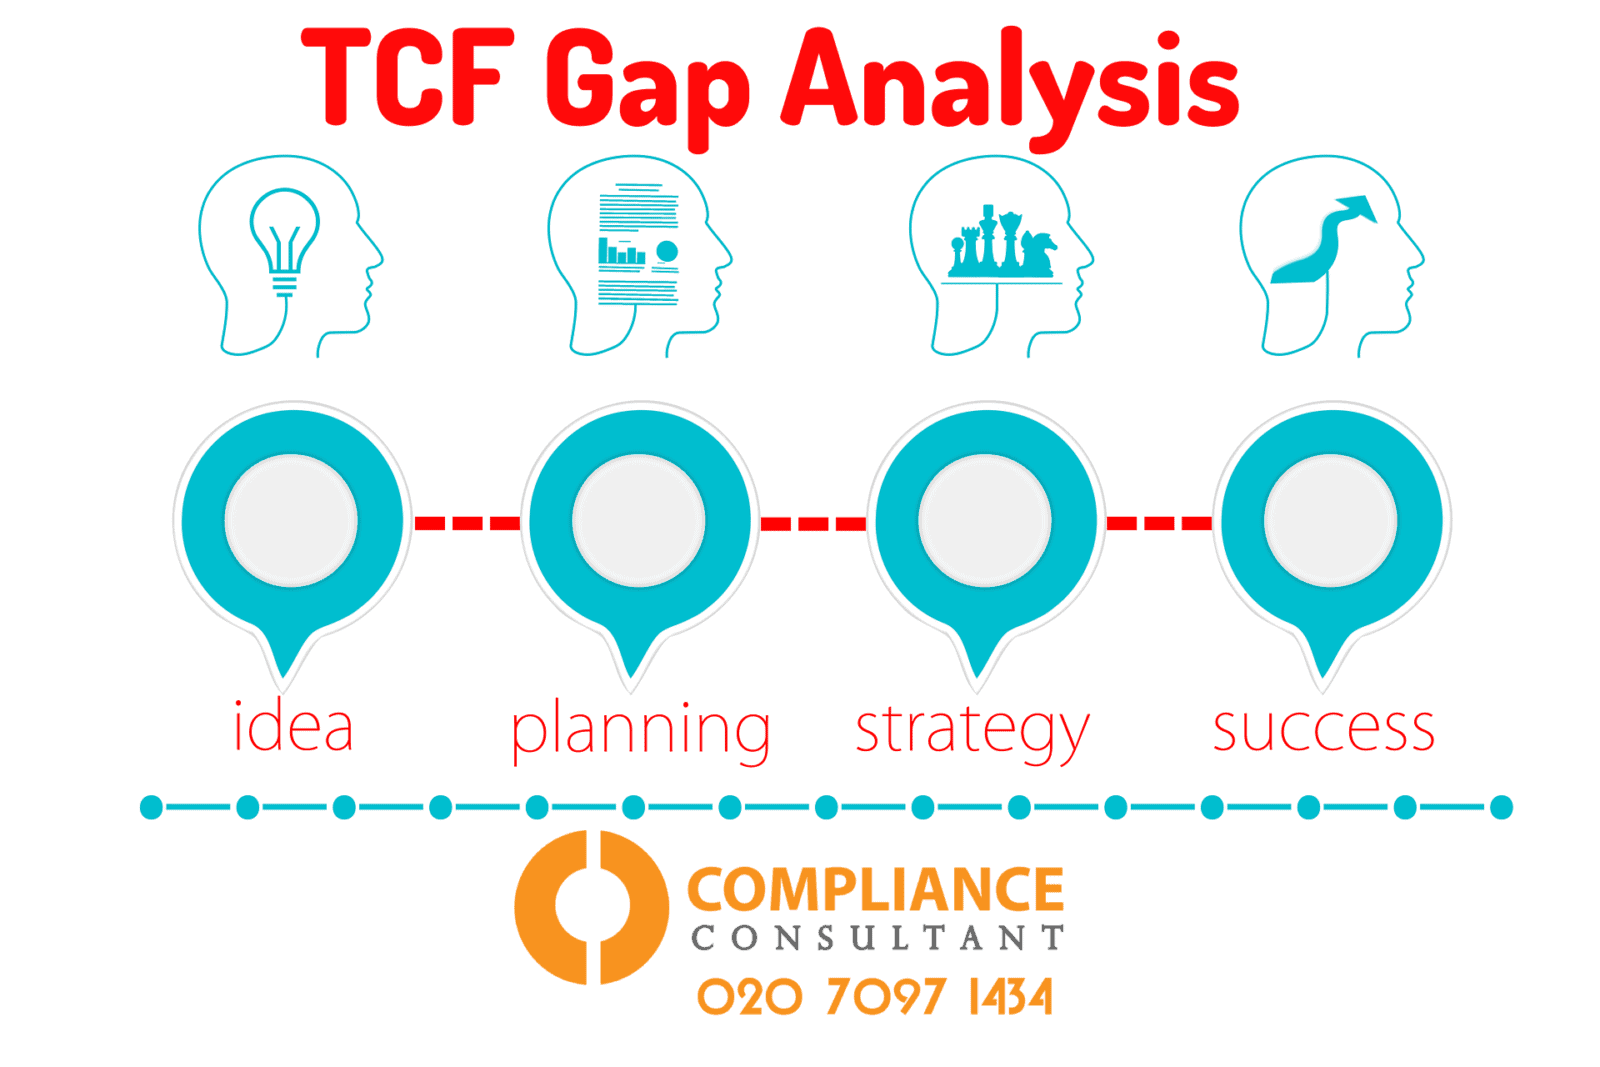 Treating Customers Fairly TCF Checklist